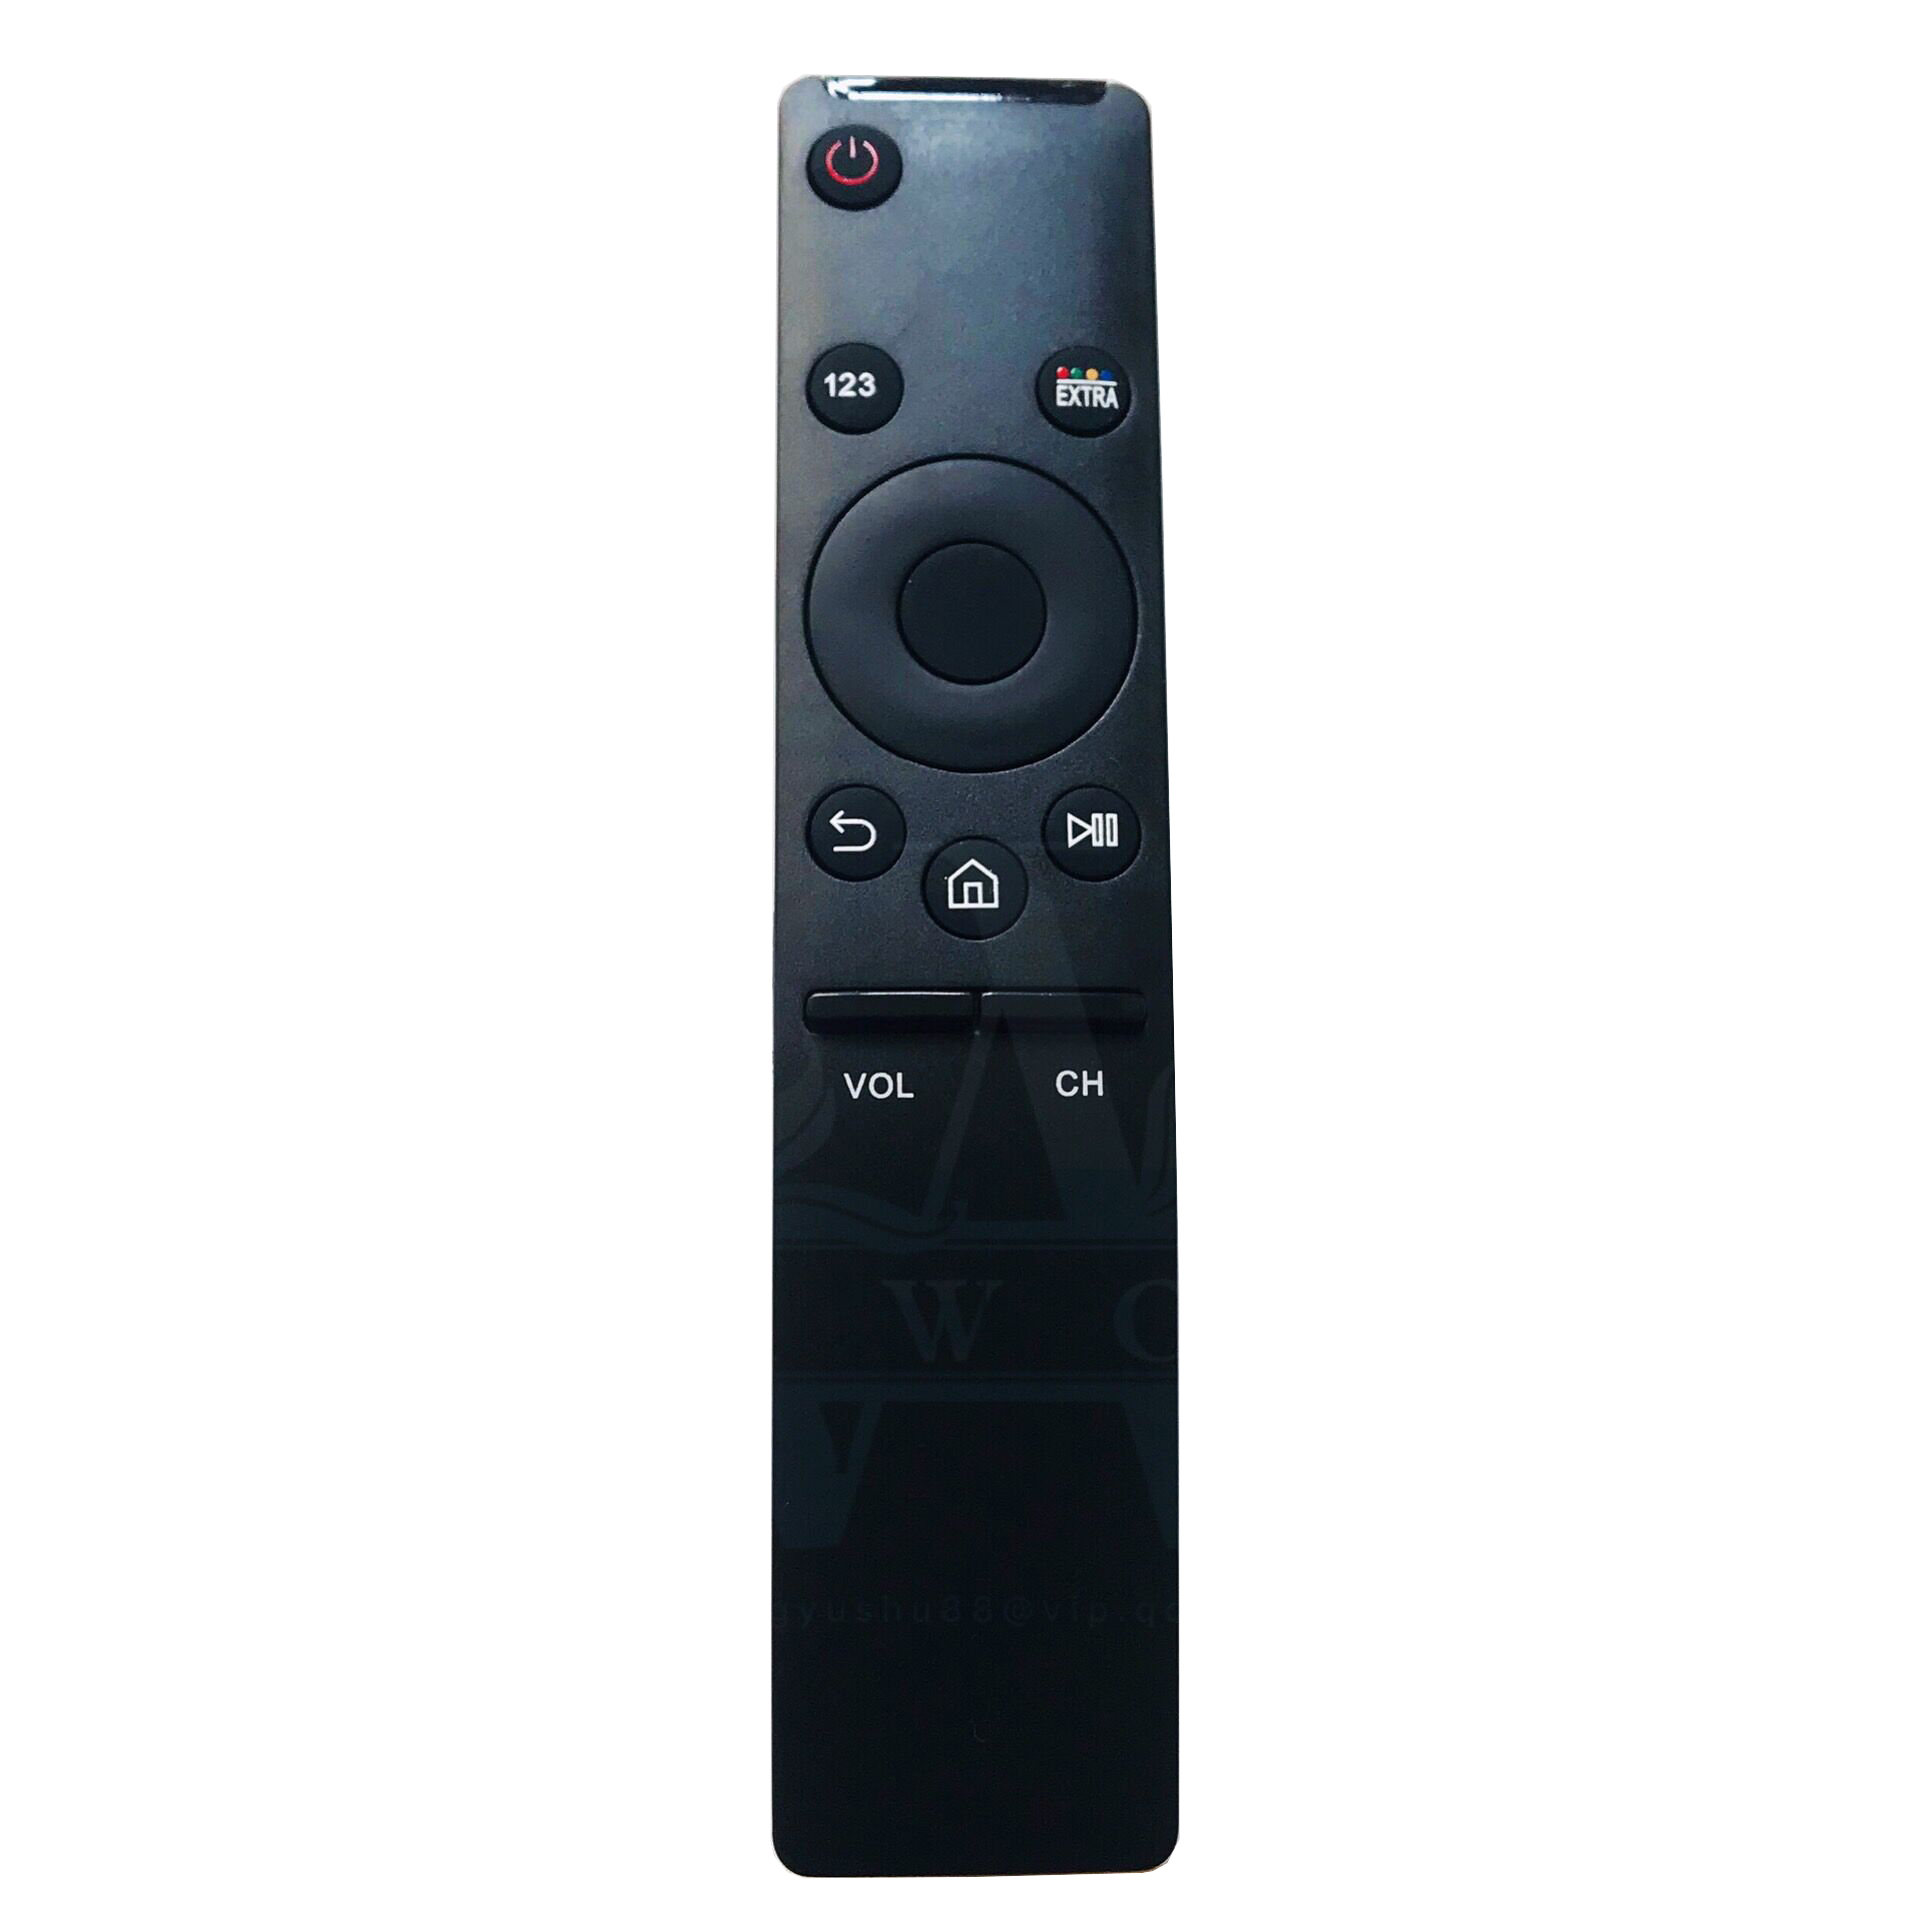 New BN59-01270A For Samsung Curved QLED 4K UHD Smart TV Remote Control BN59-01274A BN59-01292A BN59-01260A BN59-01290A